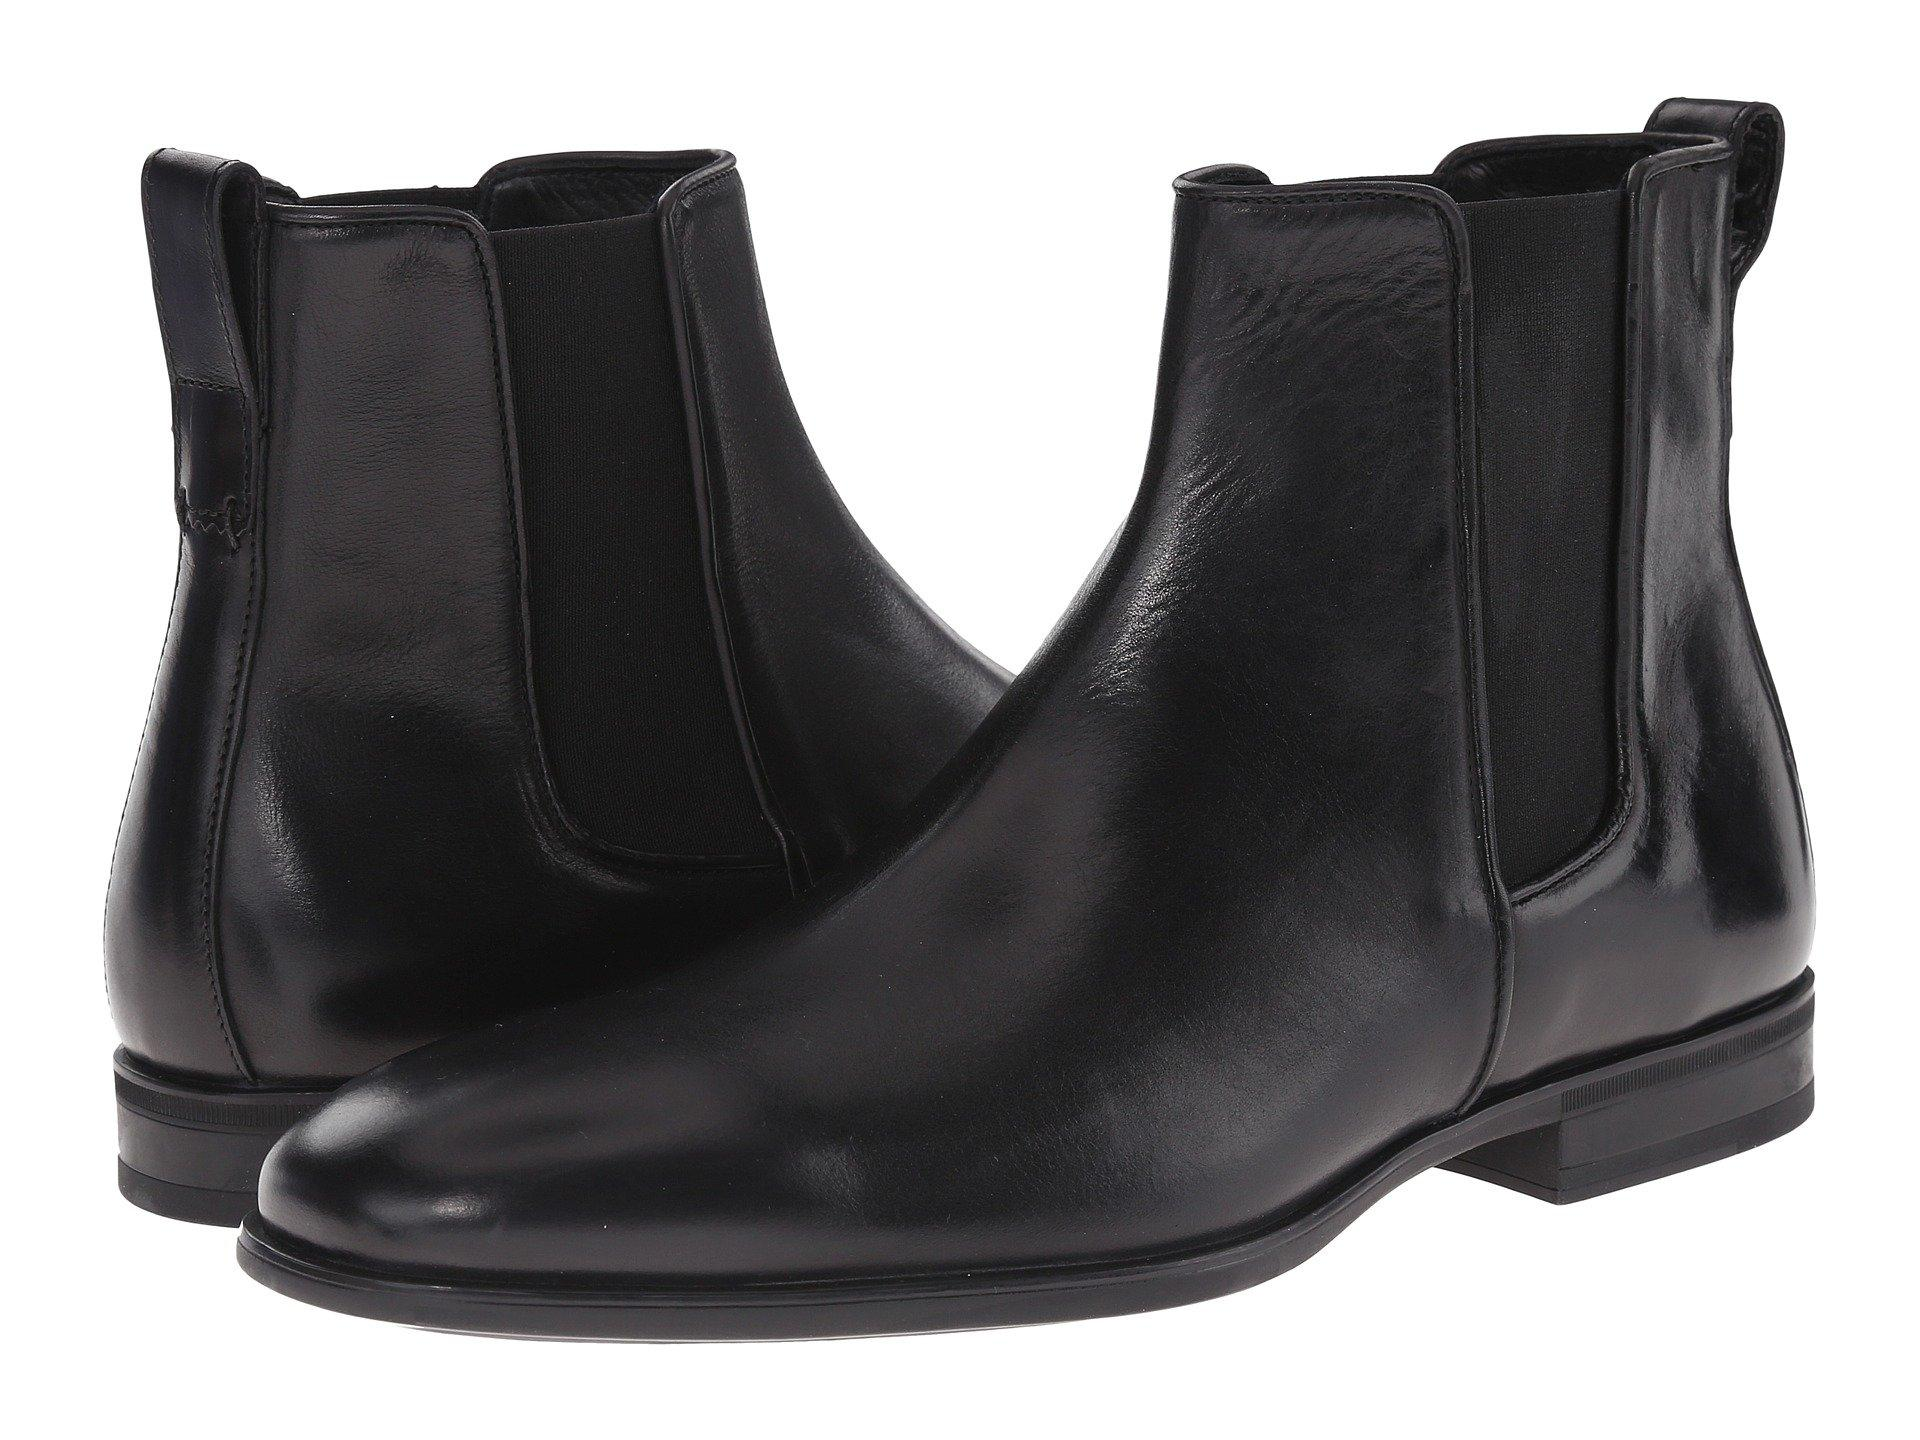 67afe9d95ab Lyst - Aquatalia Adrian (sand) Men s Pull-on Boots in Black for Men